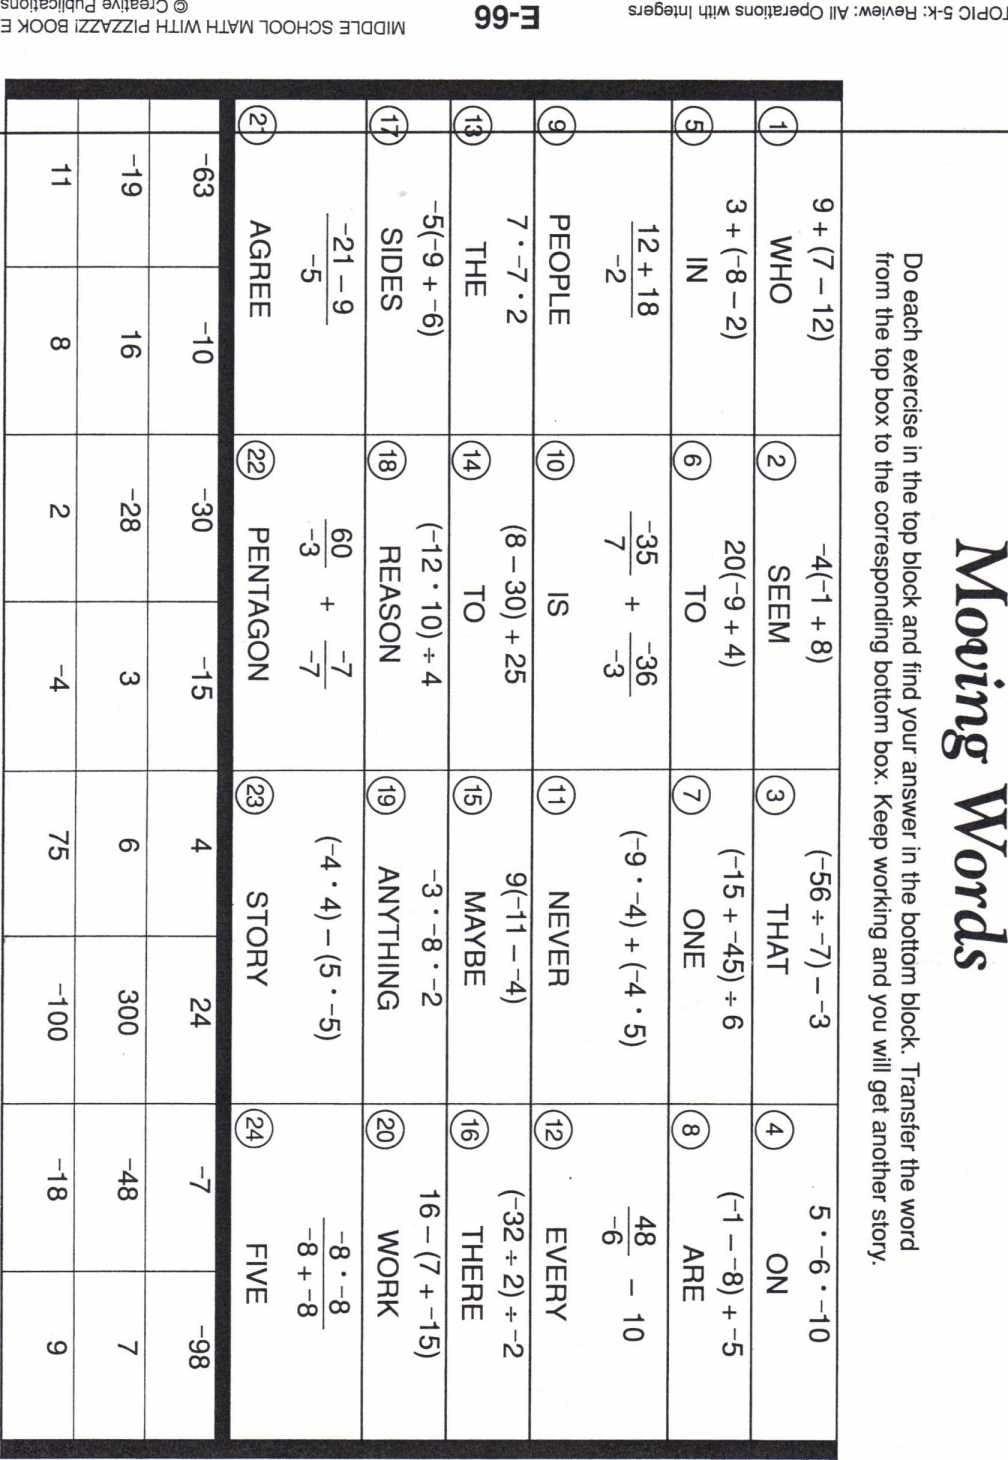 Did U Hear About Math Worksheet Answers  Yooob Regarding Moving Words Worksheet